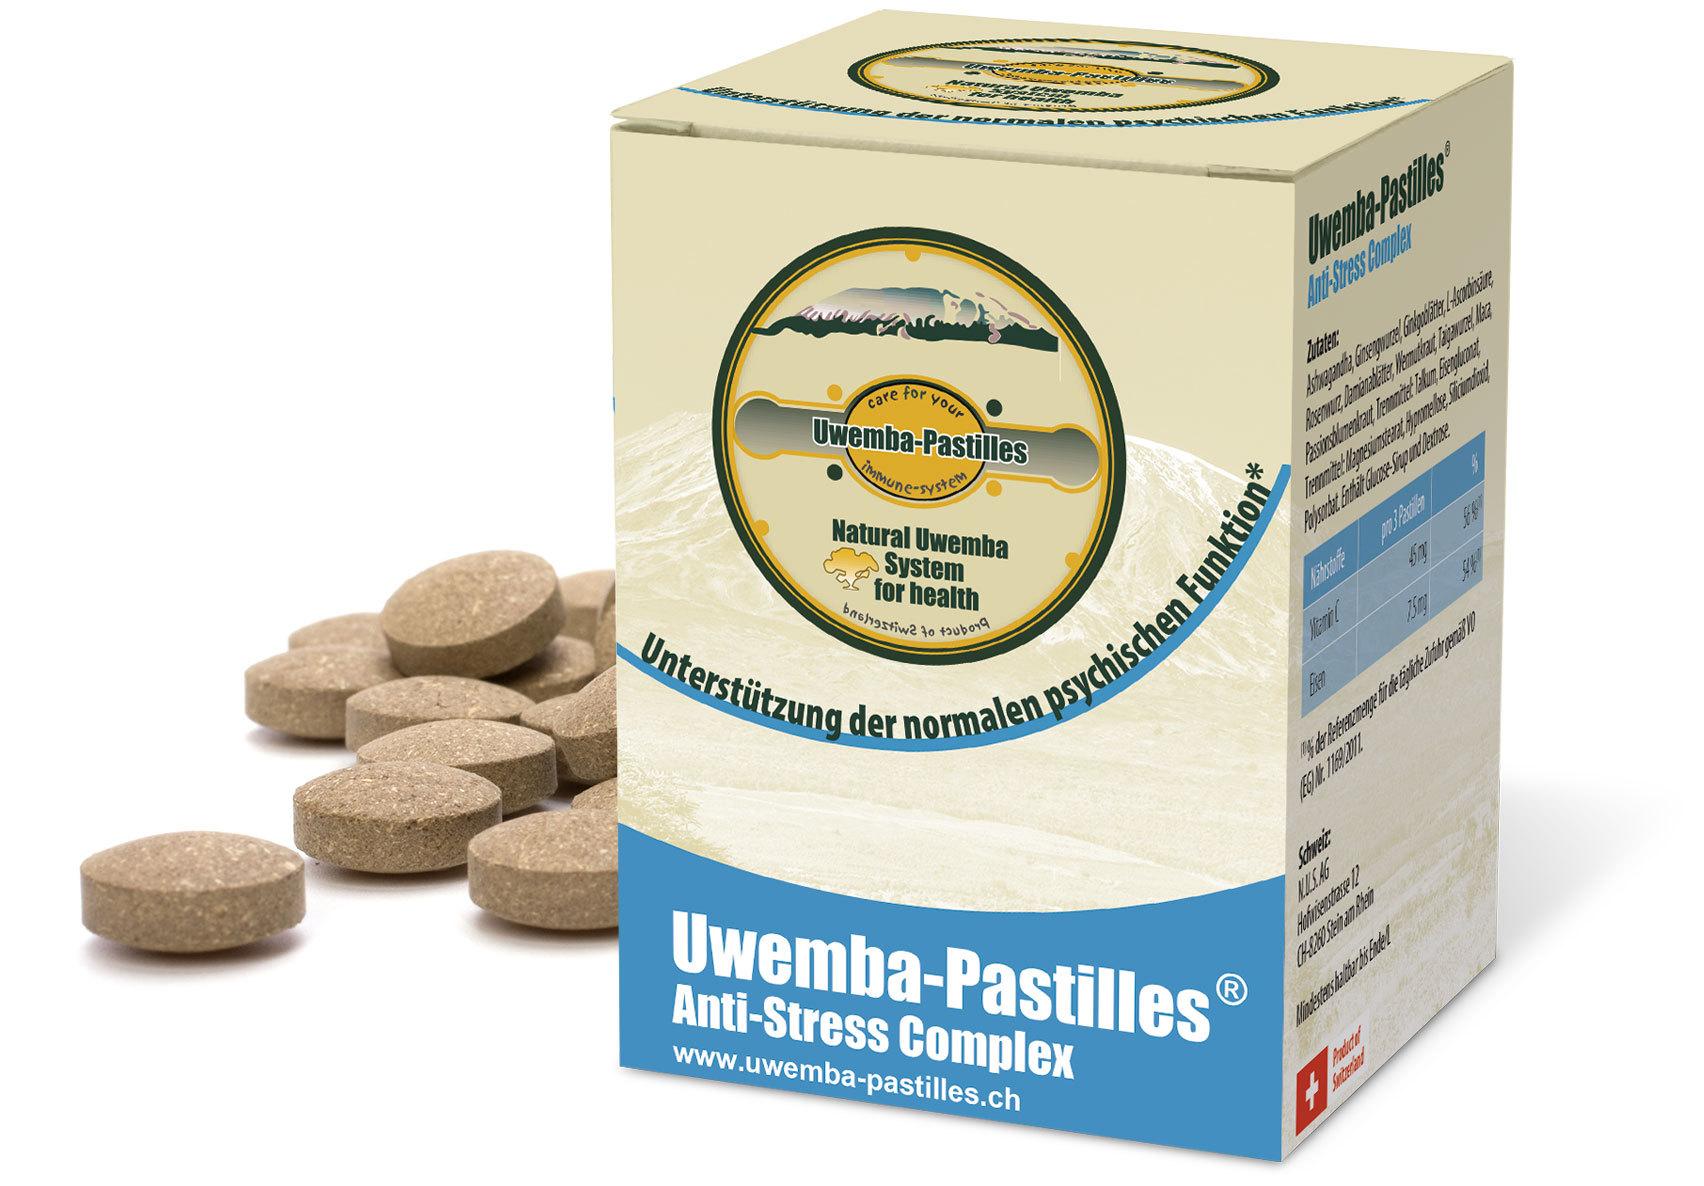 Uwemba-Pastilles® Anti-Stress Complex